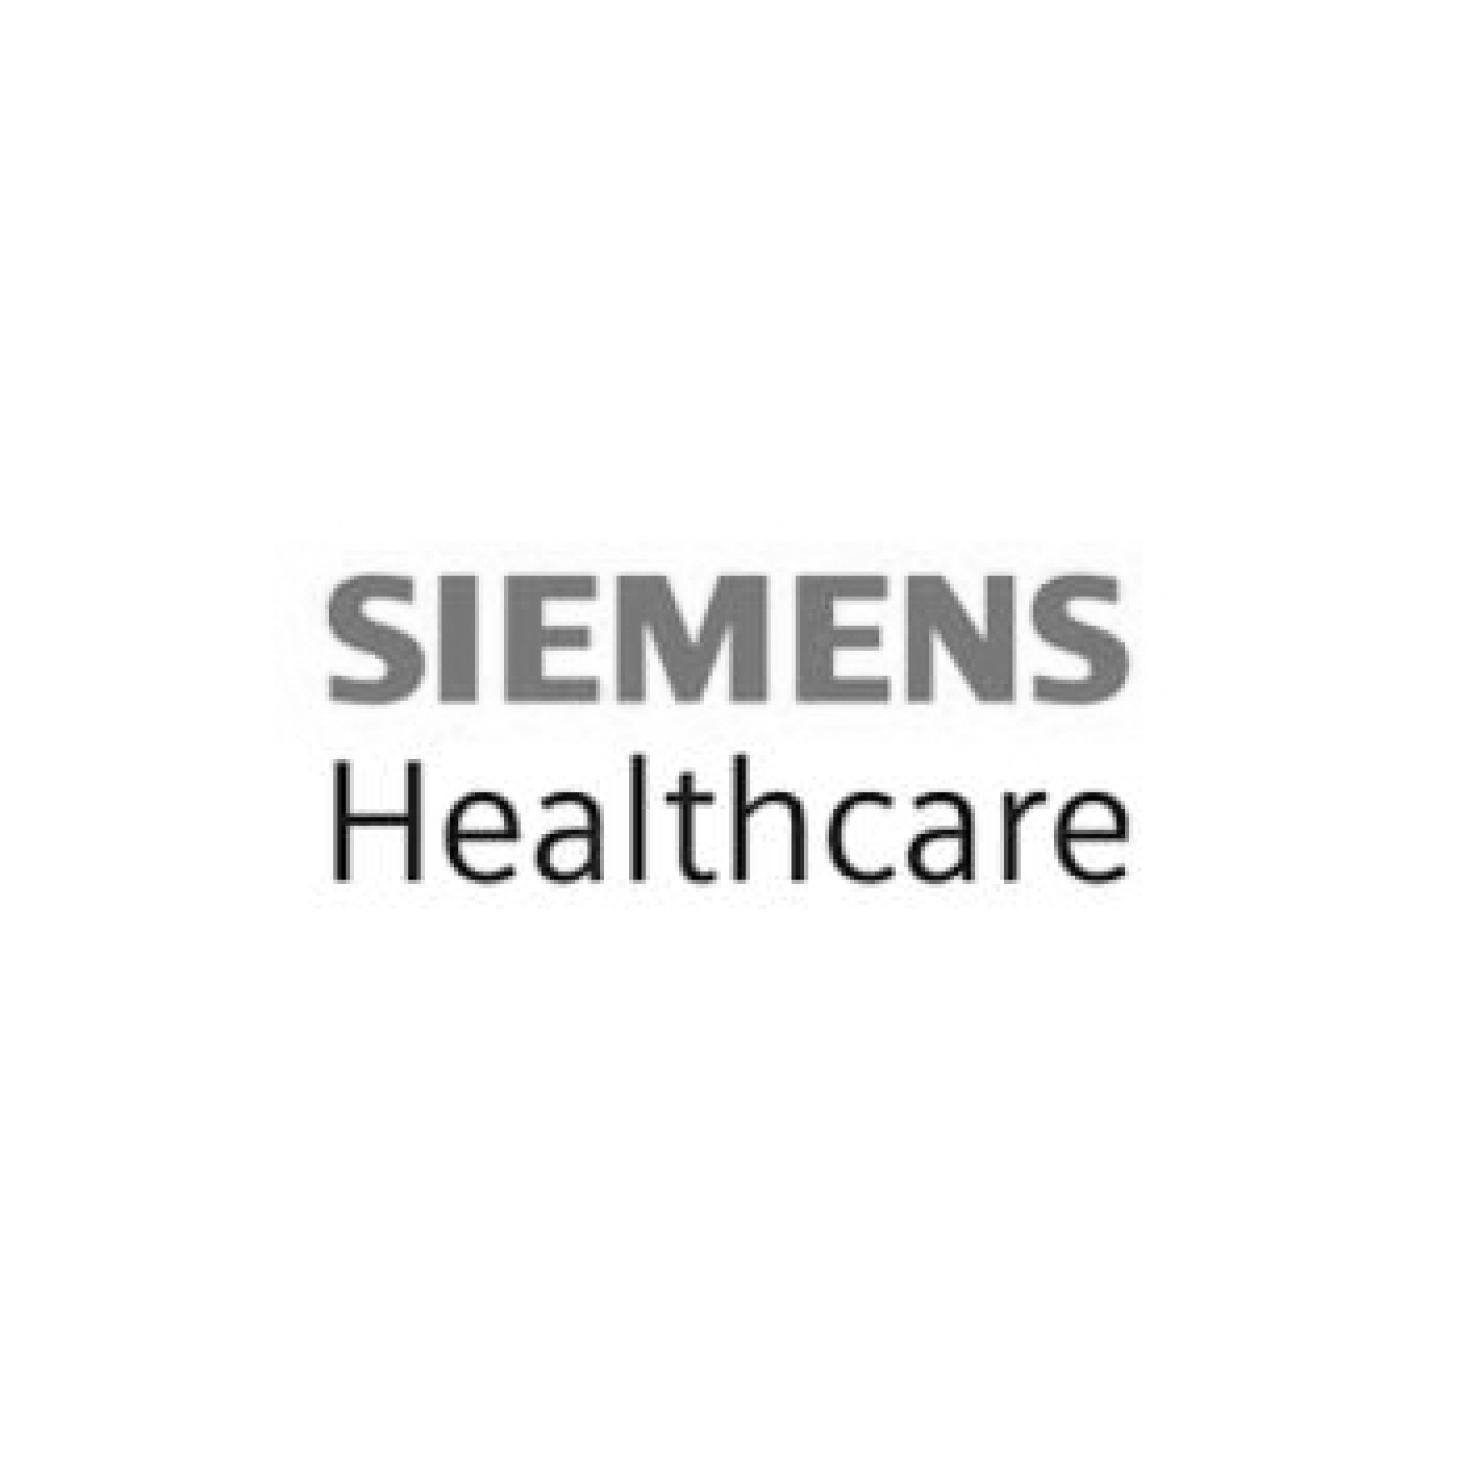 Siemens Healthcare (B&W)-01.jpg